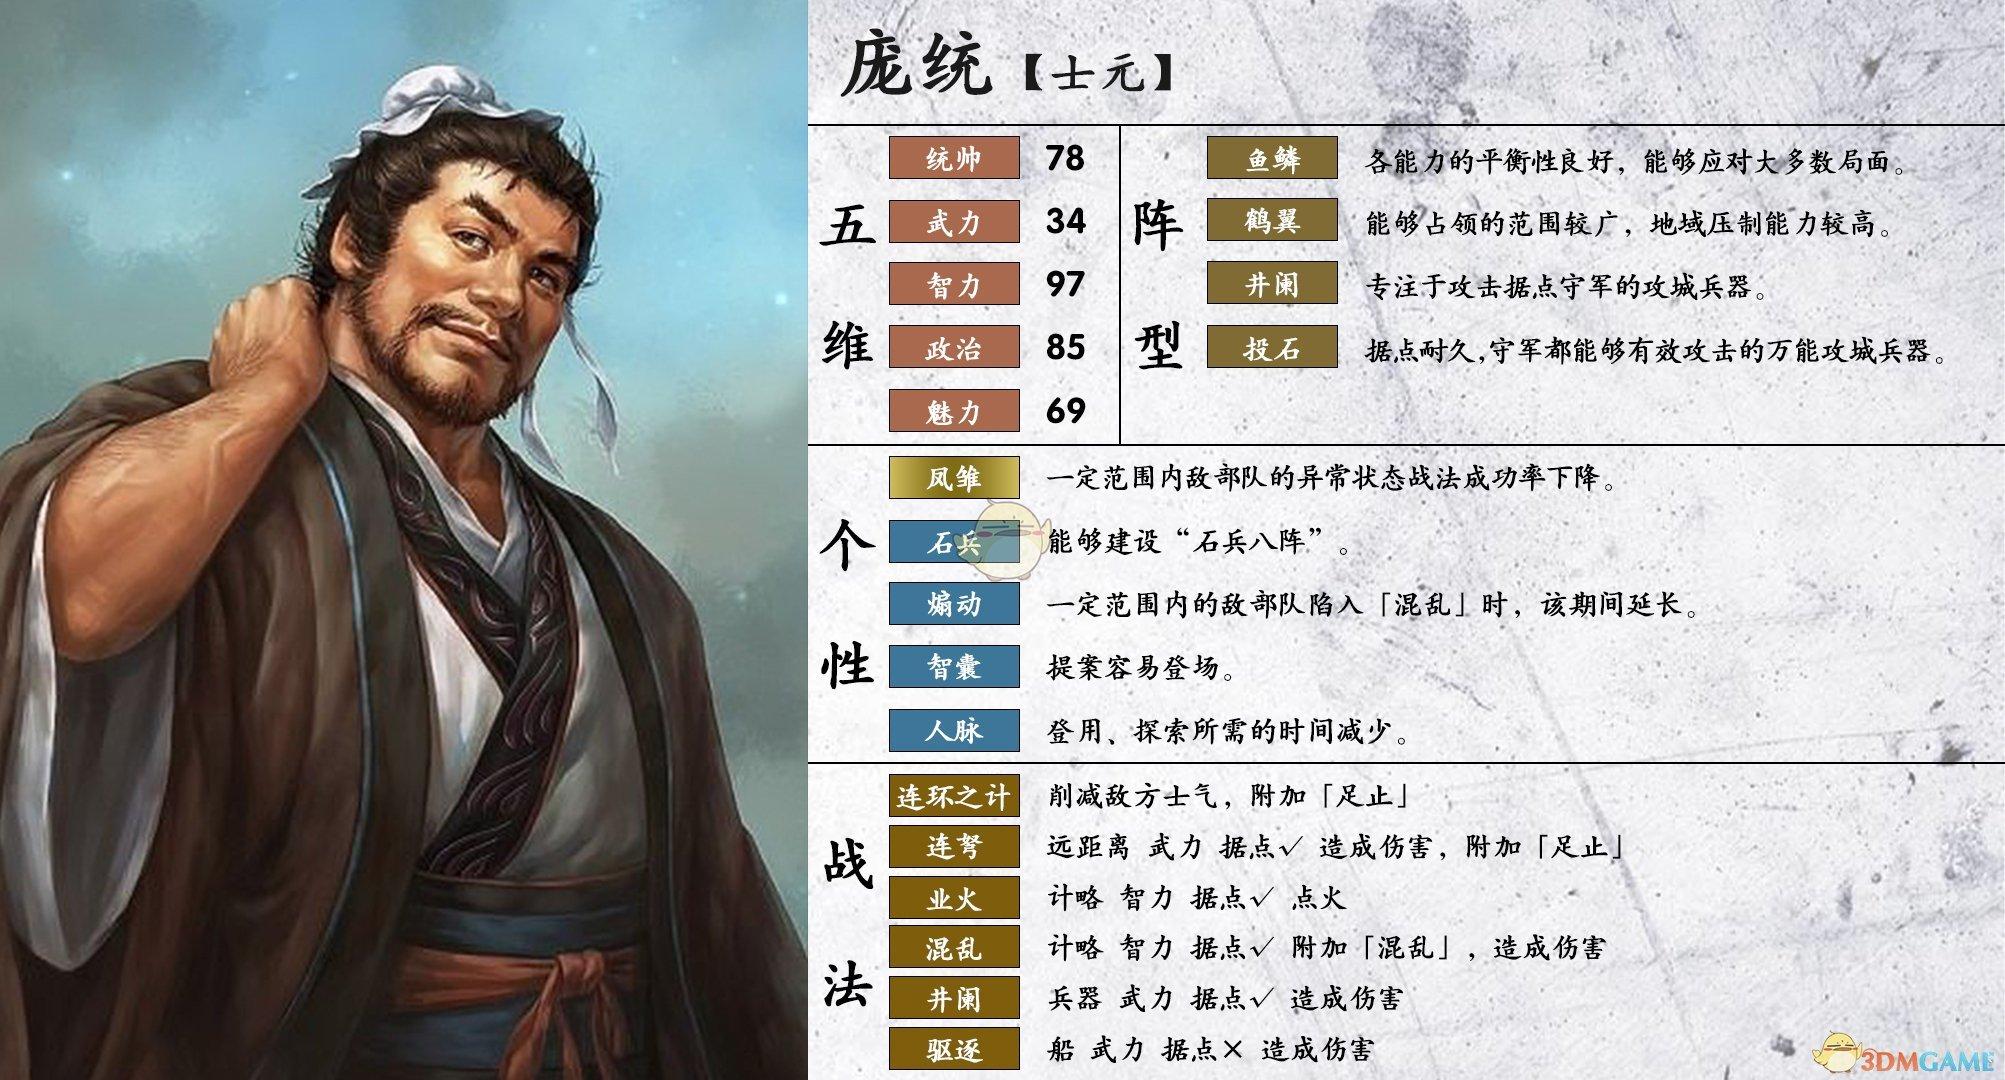 Wiki 三国志 14 【三国志14】爵位の一覧と解放される機能